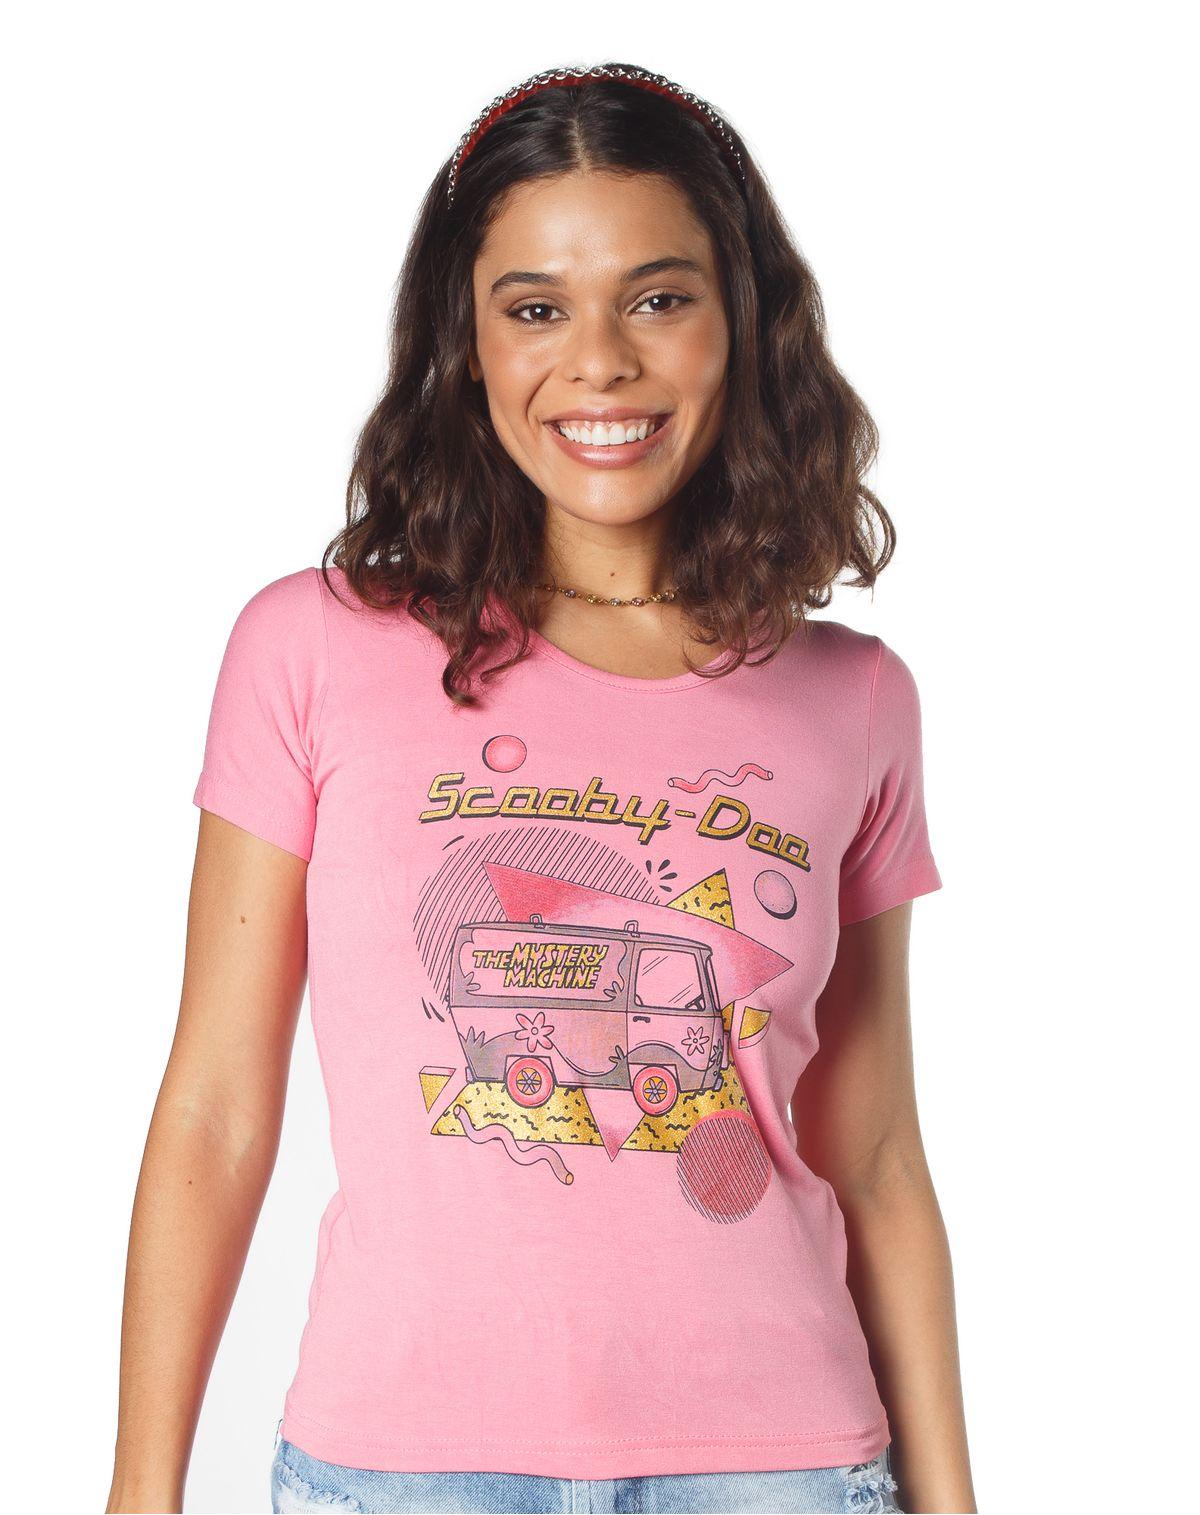 571238009-camiseta-manga-curta-feminina-estampa-scooby-doo-rosa-p-7ad